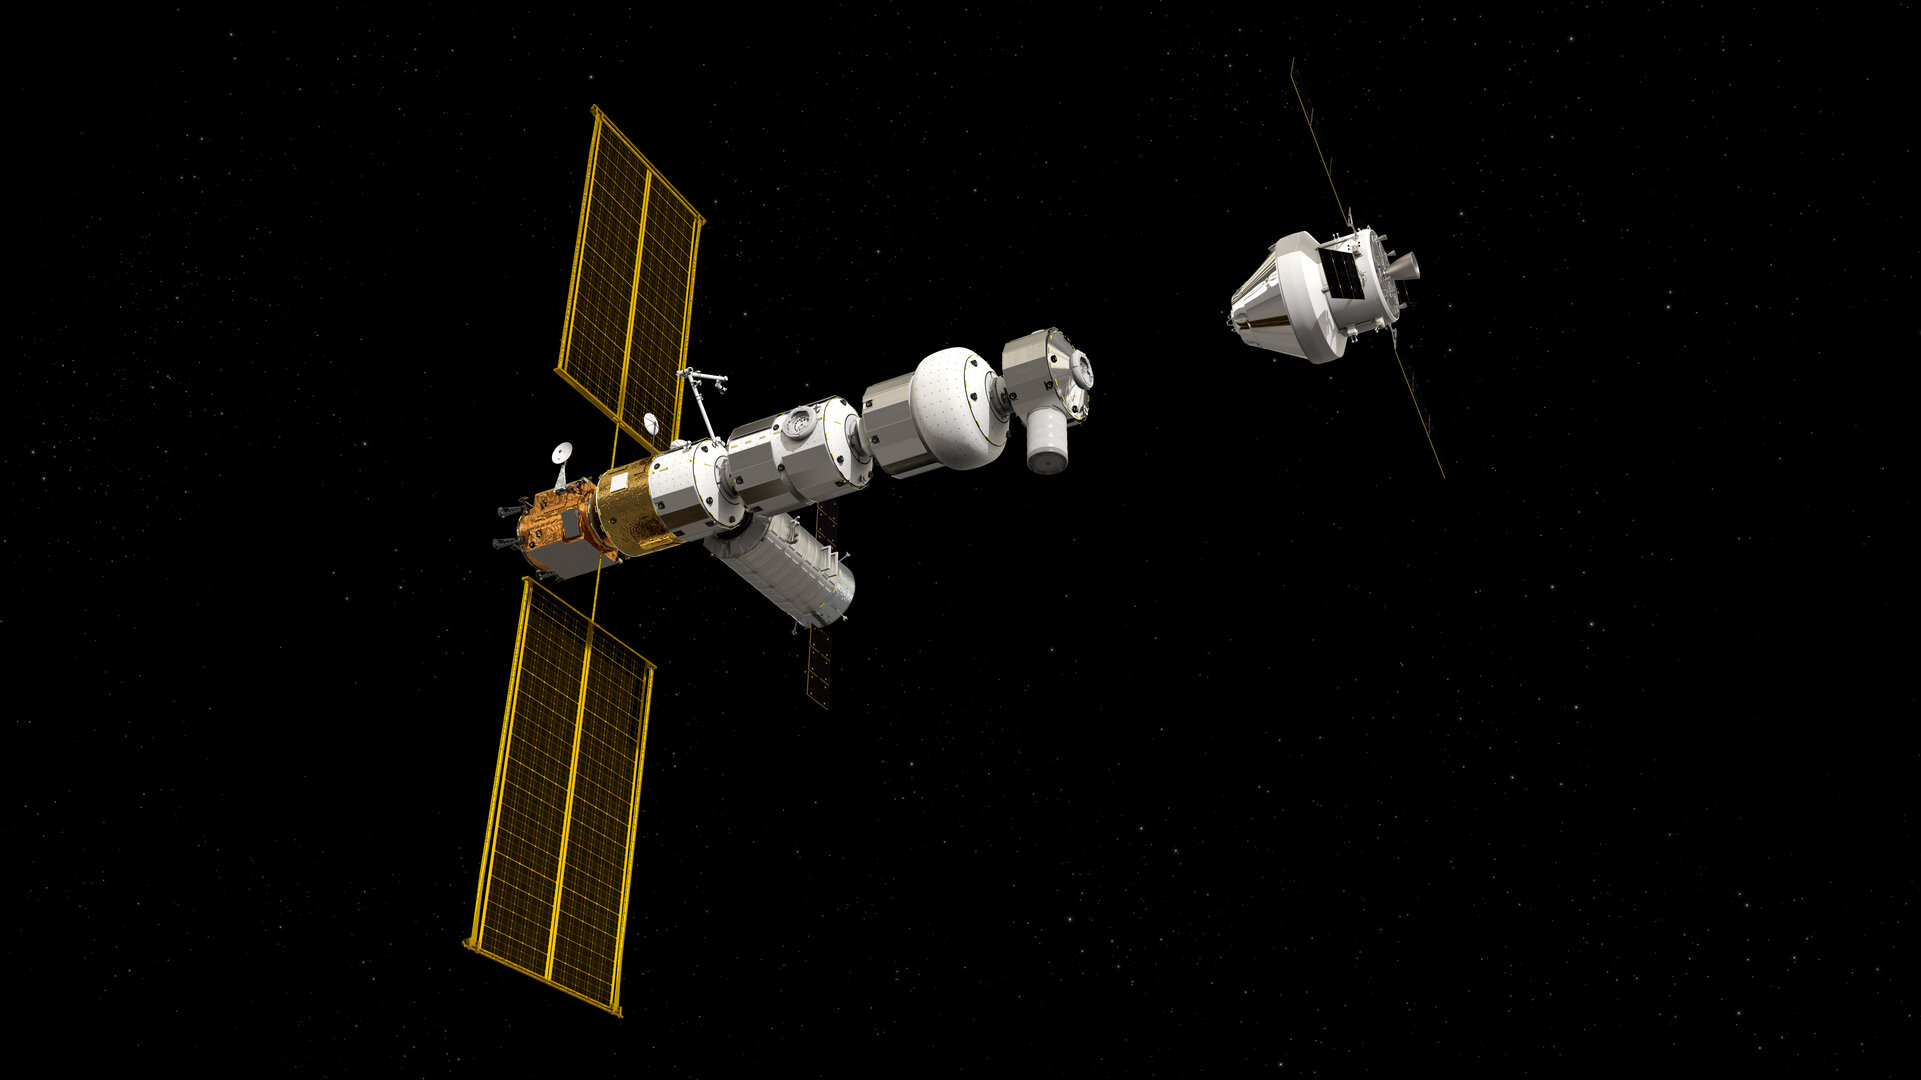 Europe will help build NASA's moon-orbiting Gateway space station thumbnail